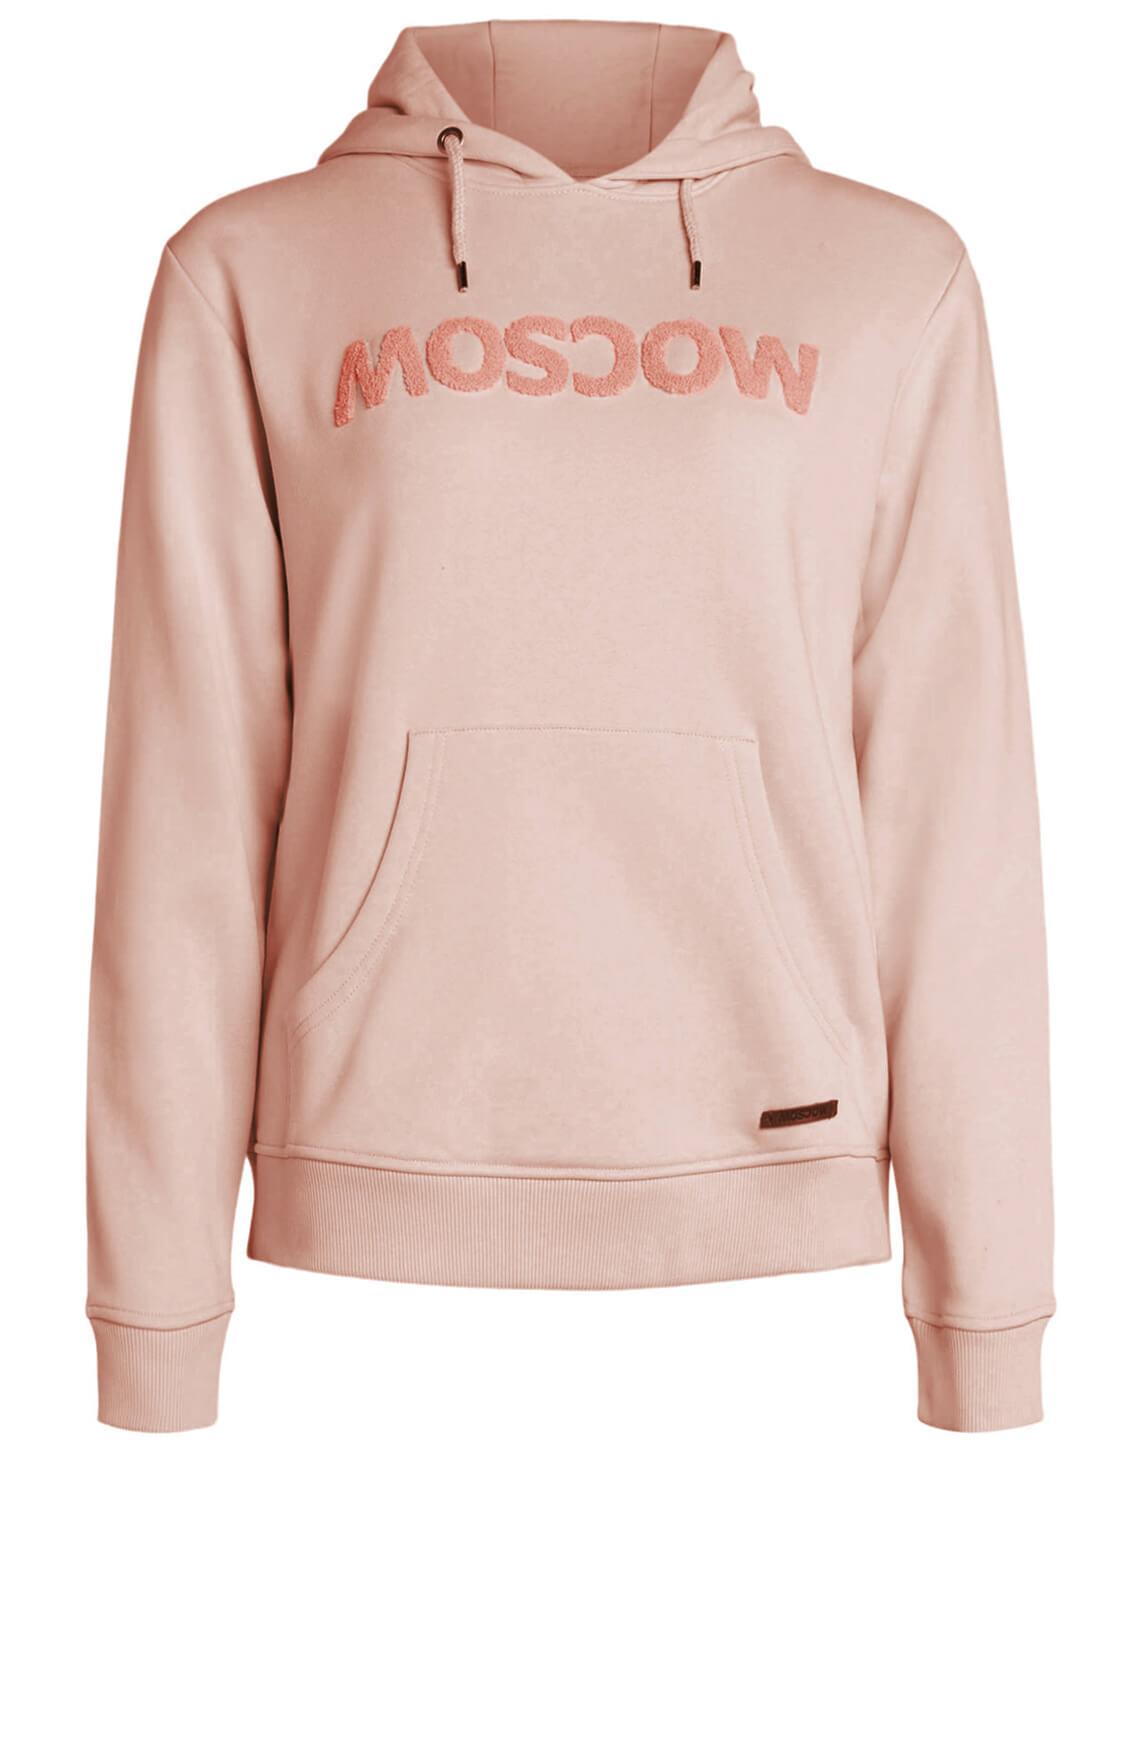 Moscow Dames Sweater met capuchon roze